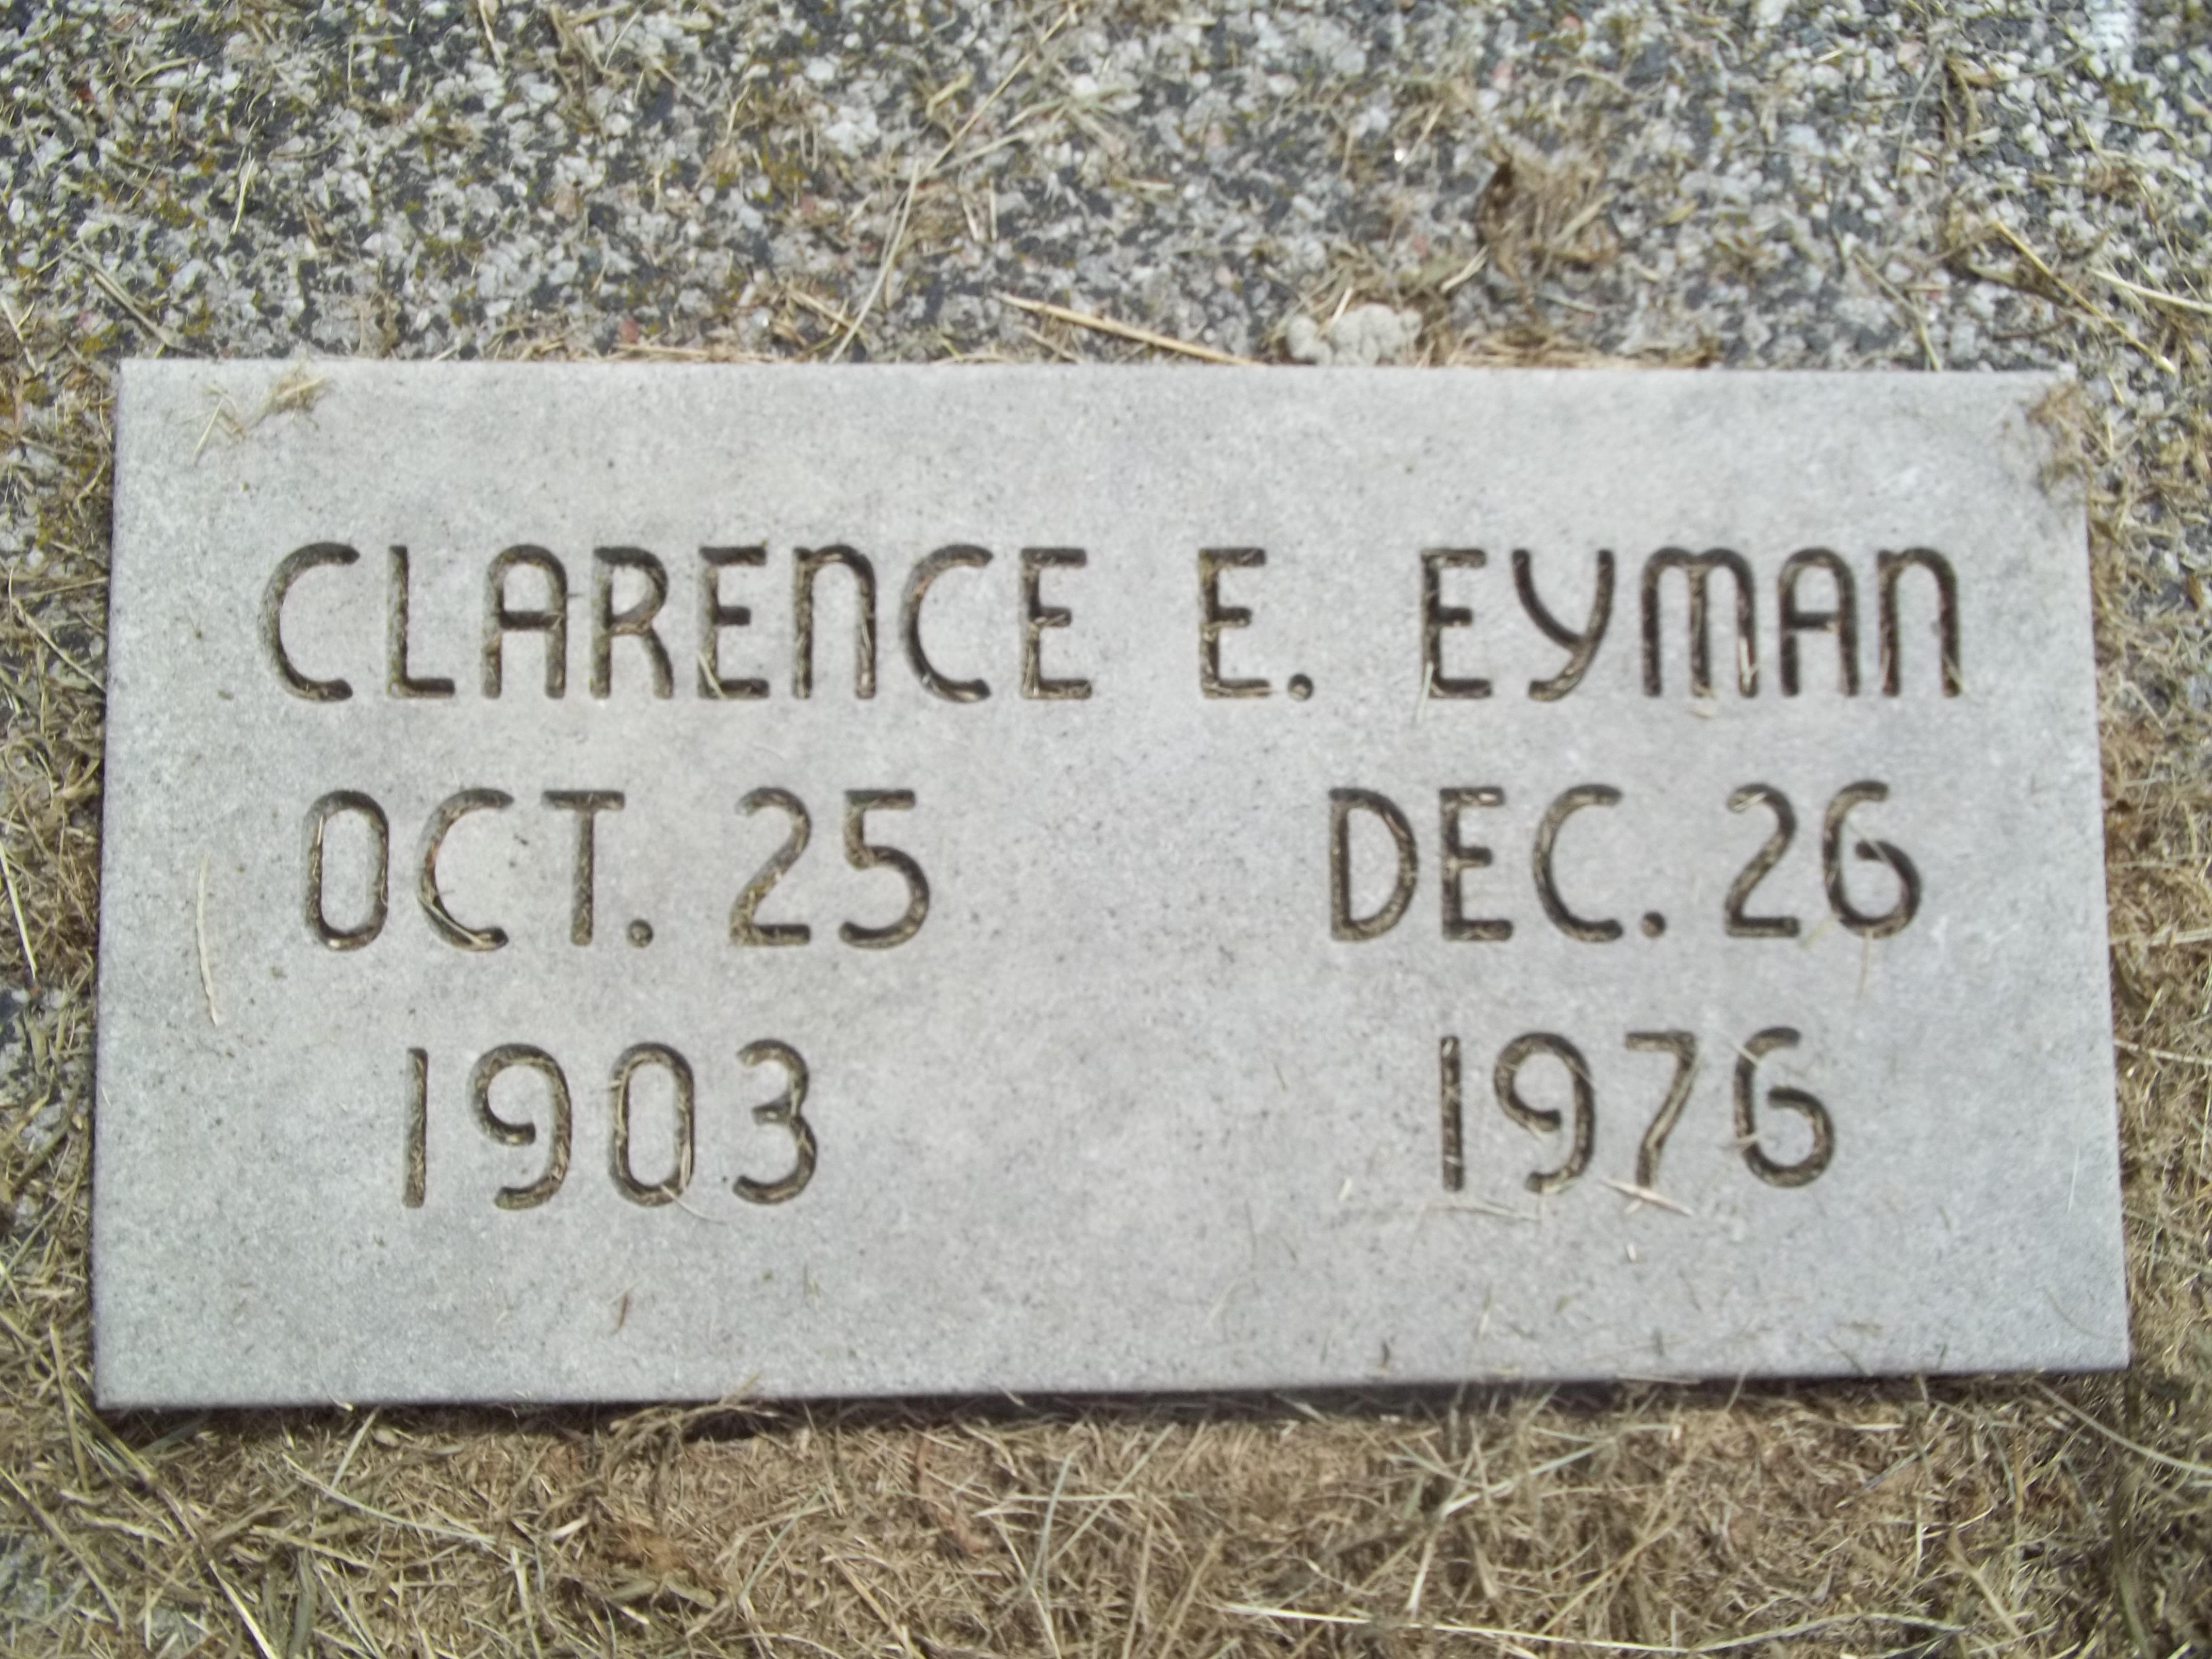 Clarence Edward Heavy Eyman